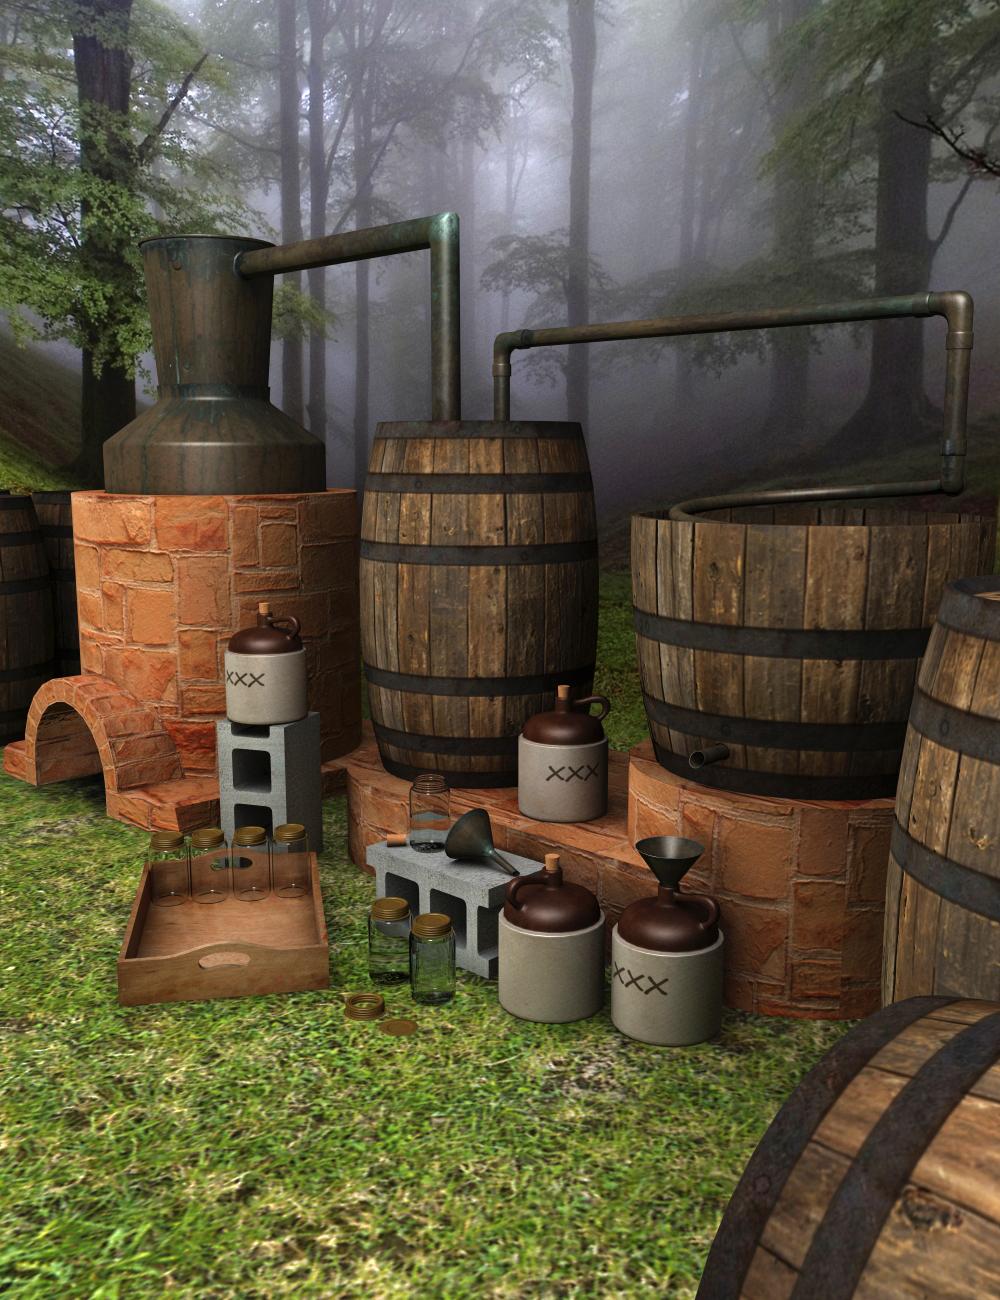 Moonshine Still by: hypnagogia, 3D Models by Daz 3D